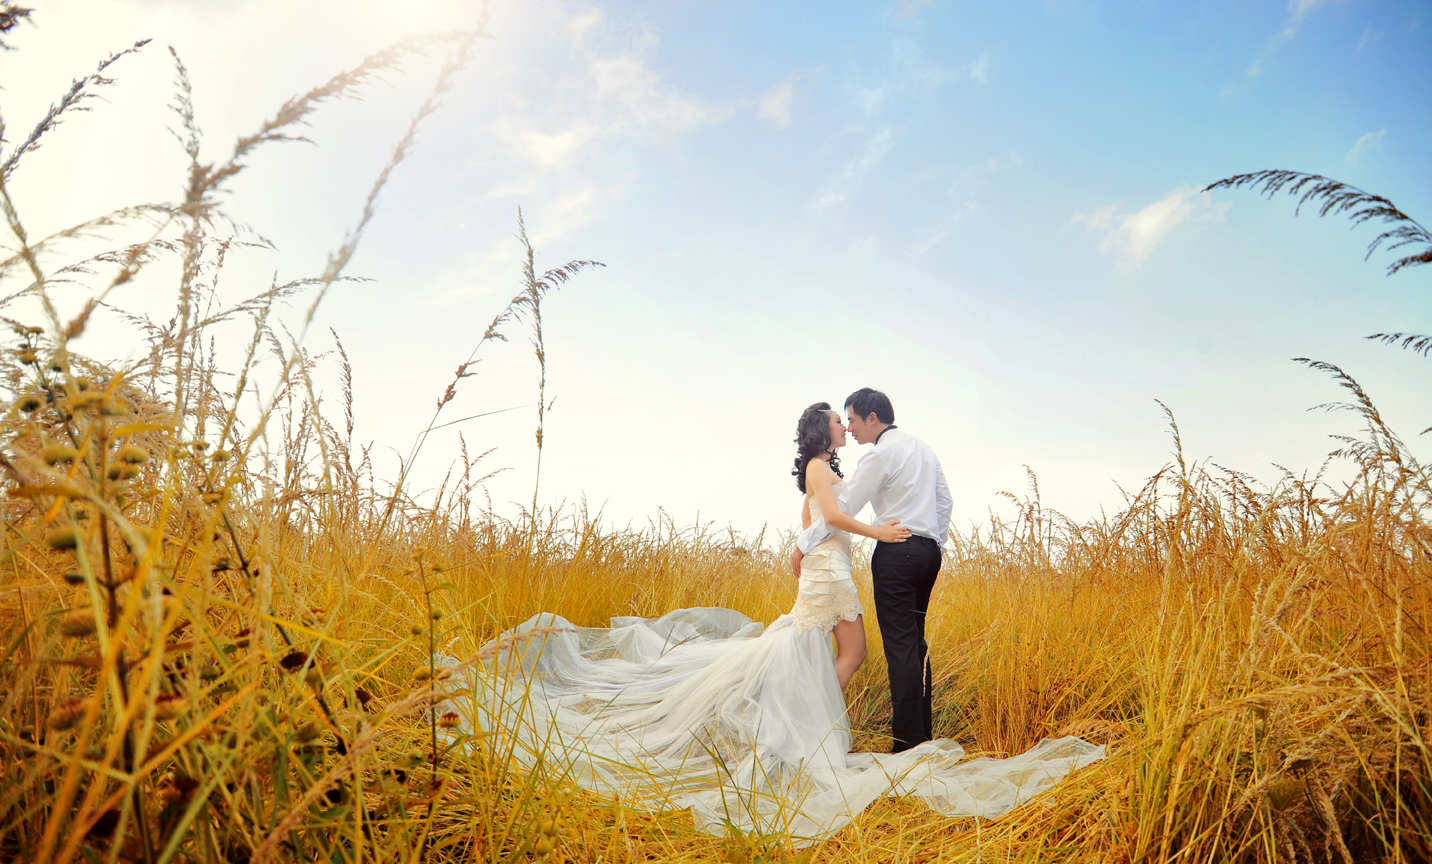 Pre-wedding Photoshoot Ideas, Indoor And Outdoor